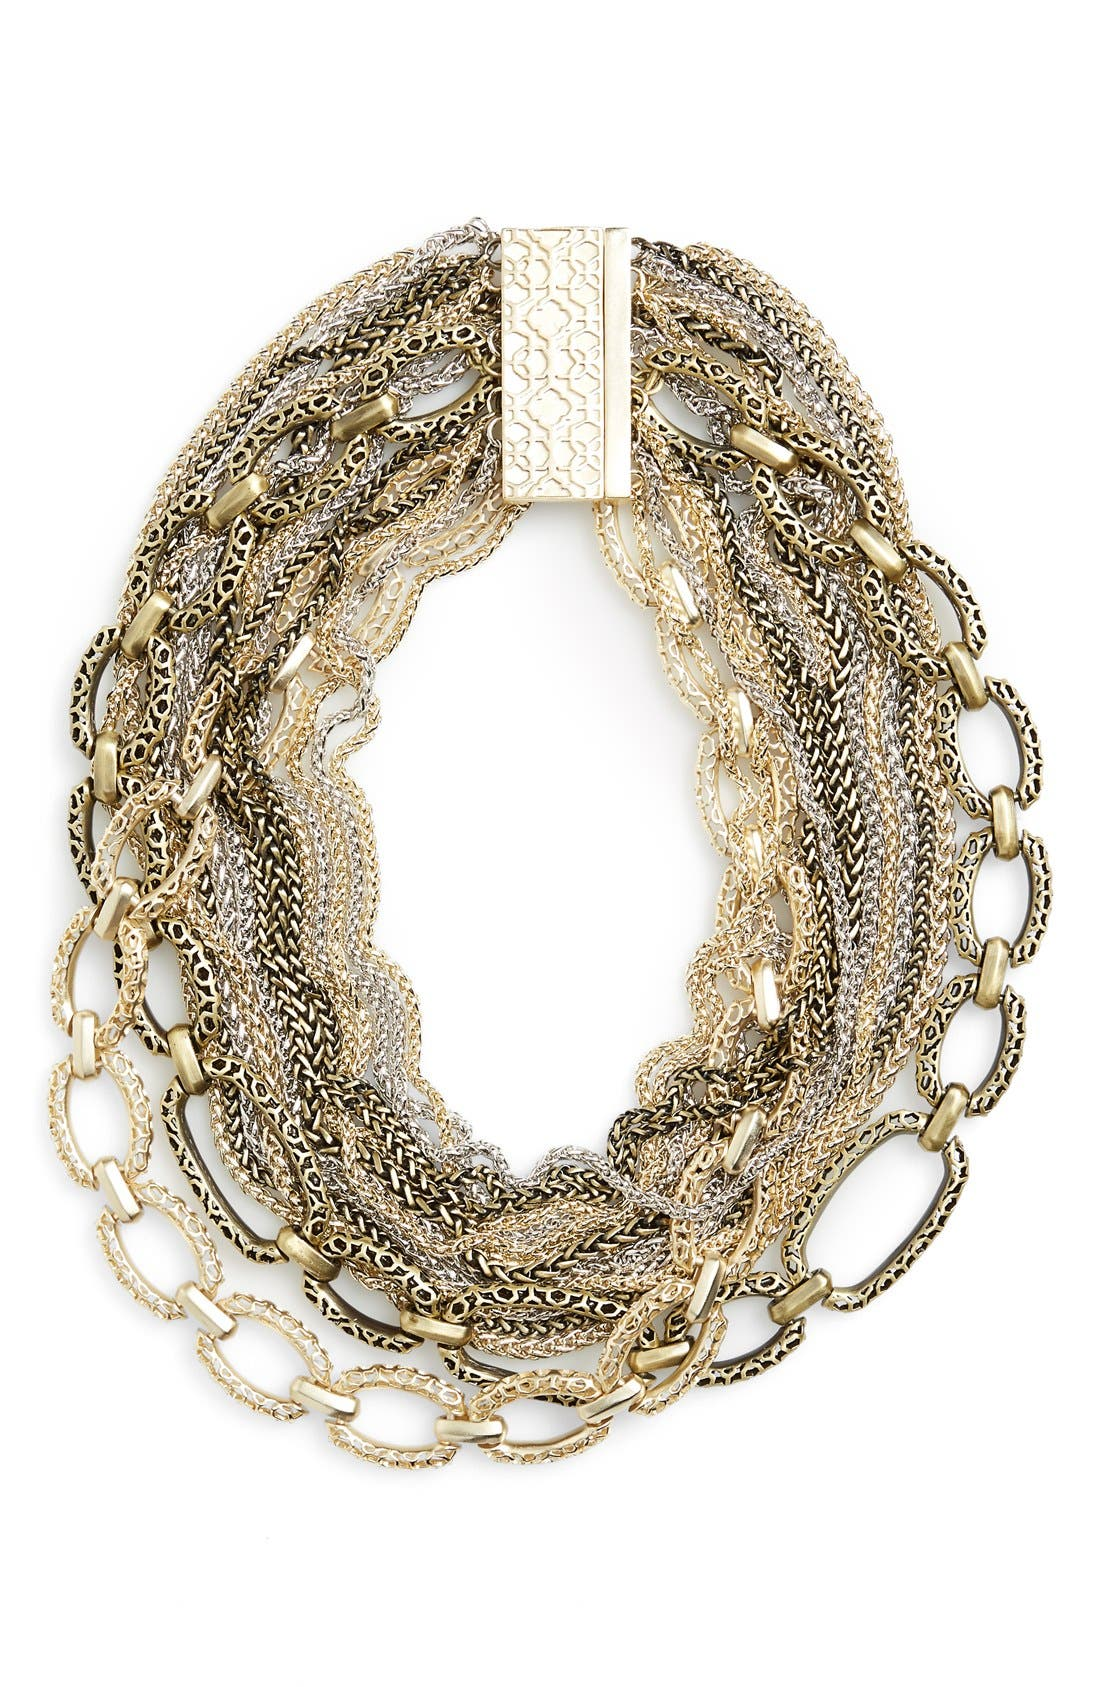 Alternate Image 1 Selected - Kendra Scott 'Marci' Mulistrand Collar Necklace